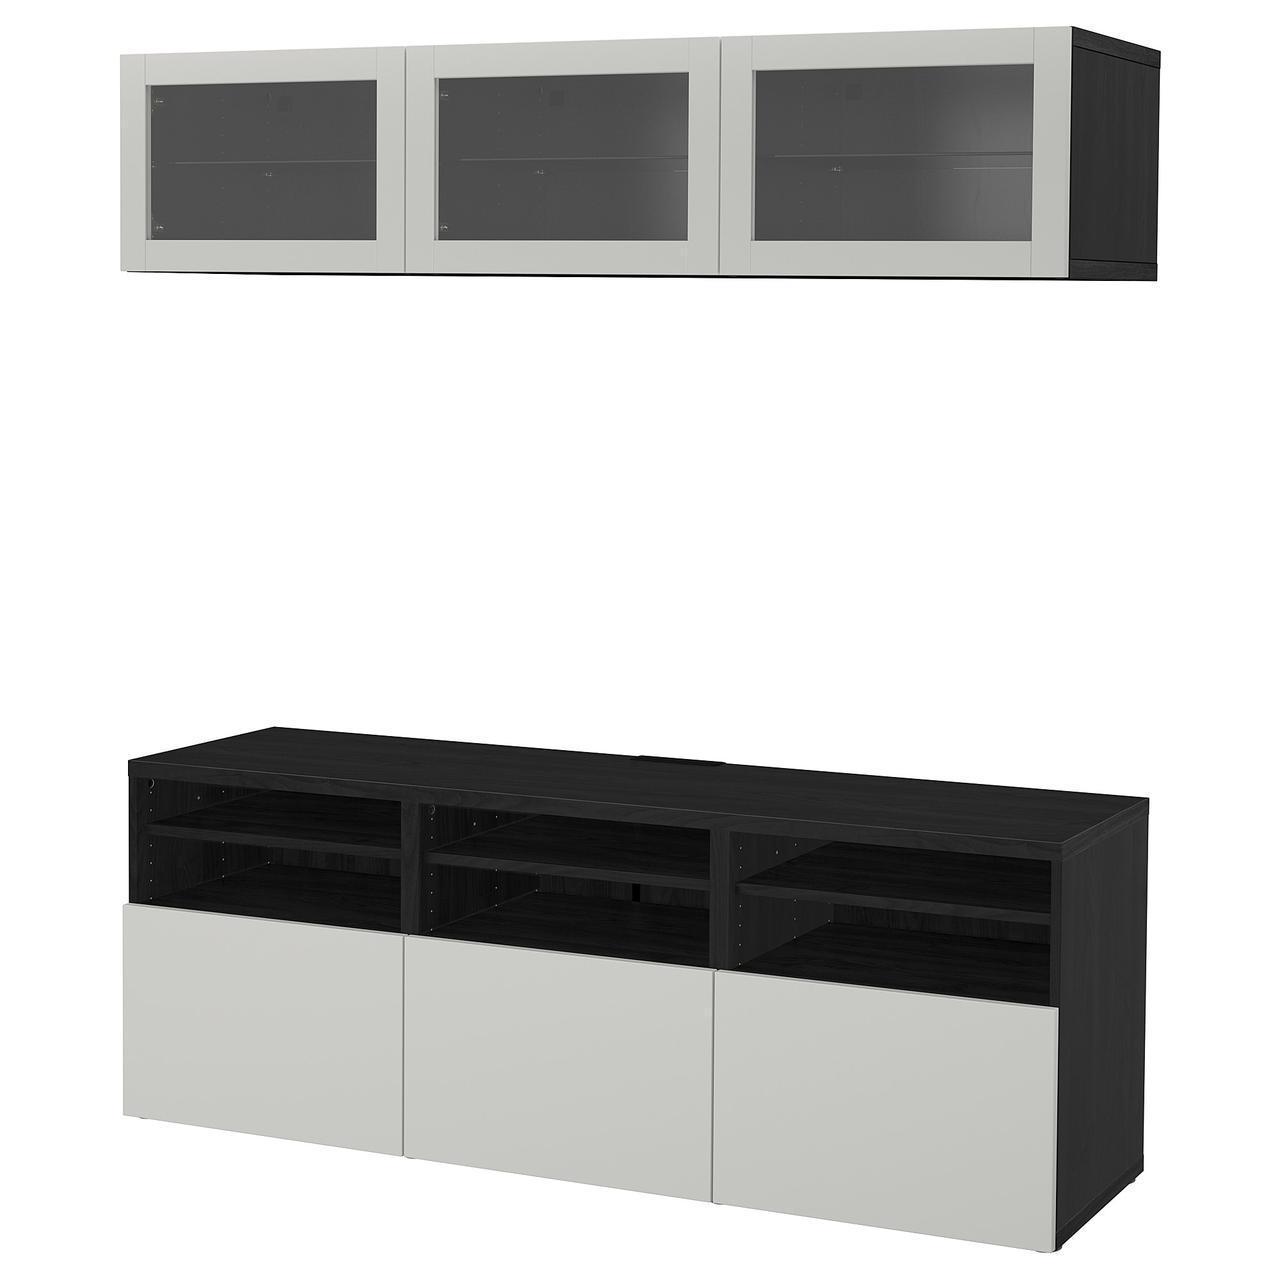 IKEA BESTA Тумба під телевізор з скляними дверима, чорно-коричневий (992.031.12)